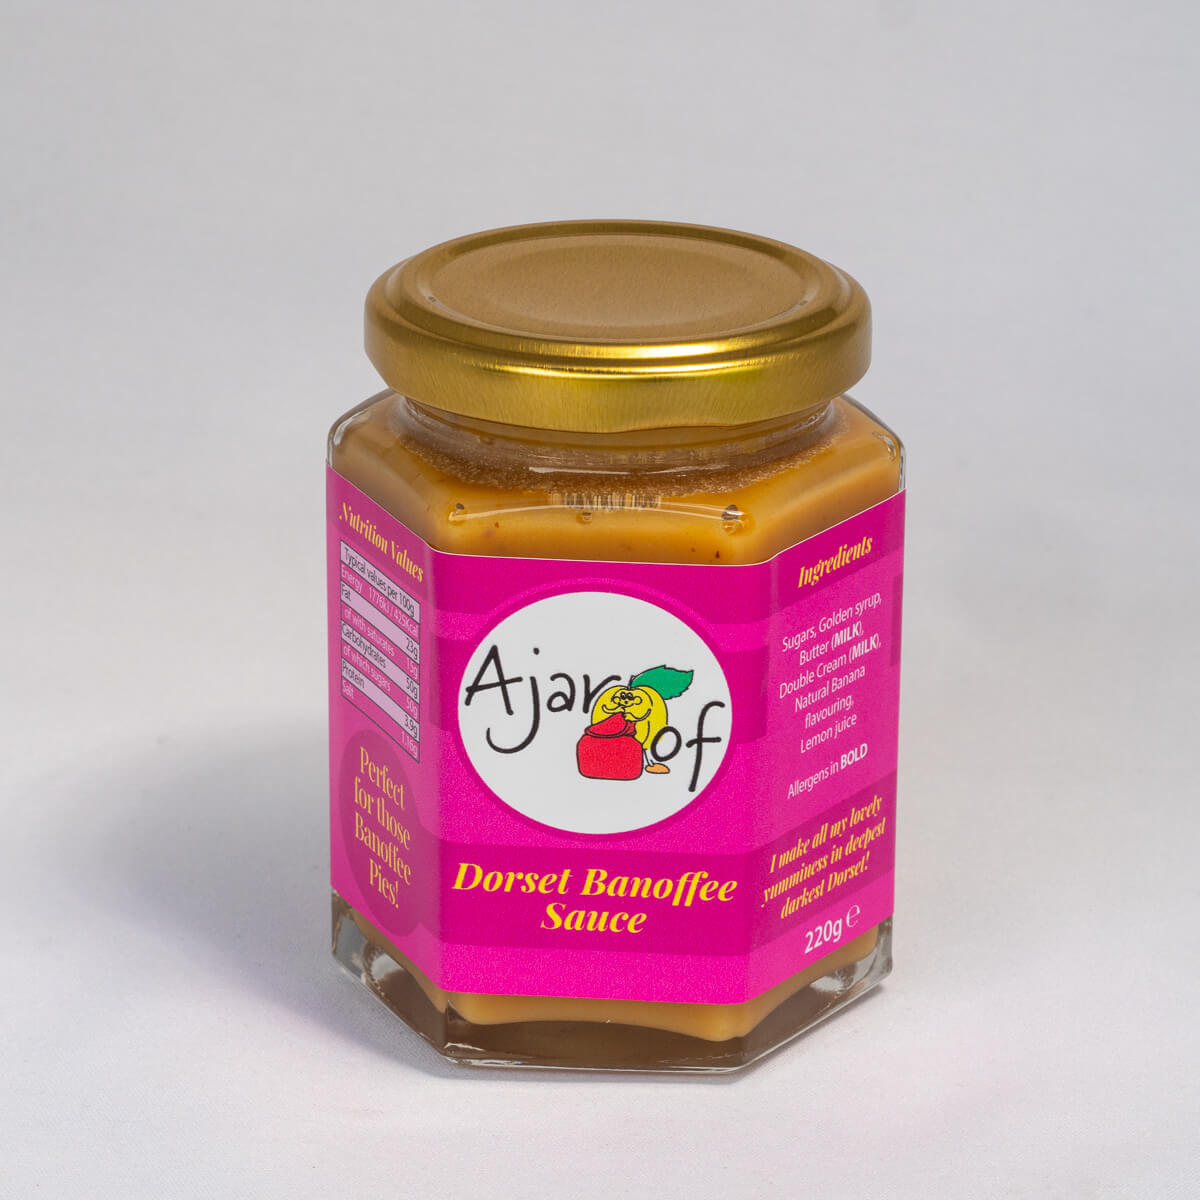 dorset-banoffee-sauce